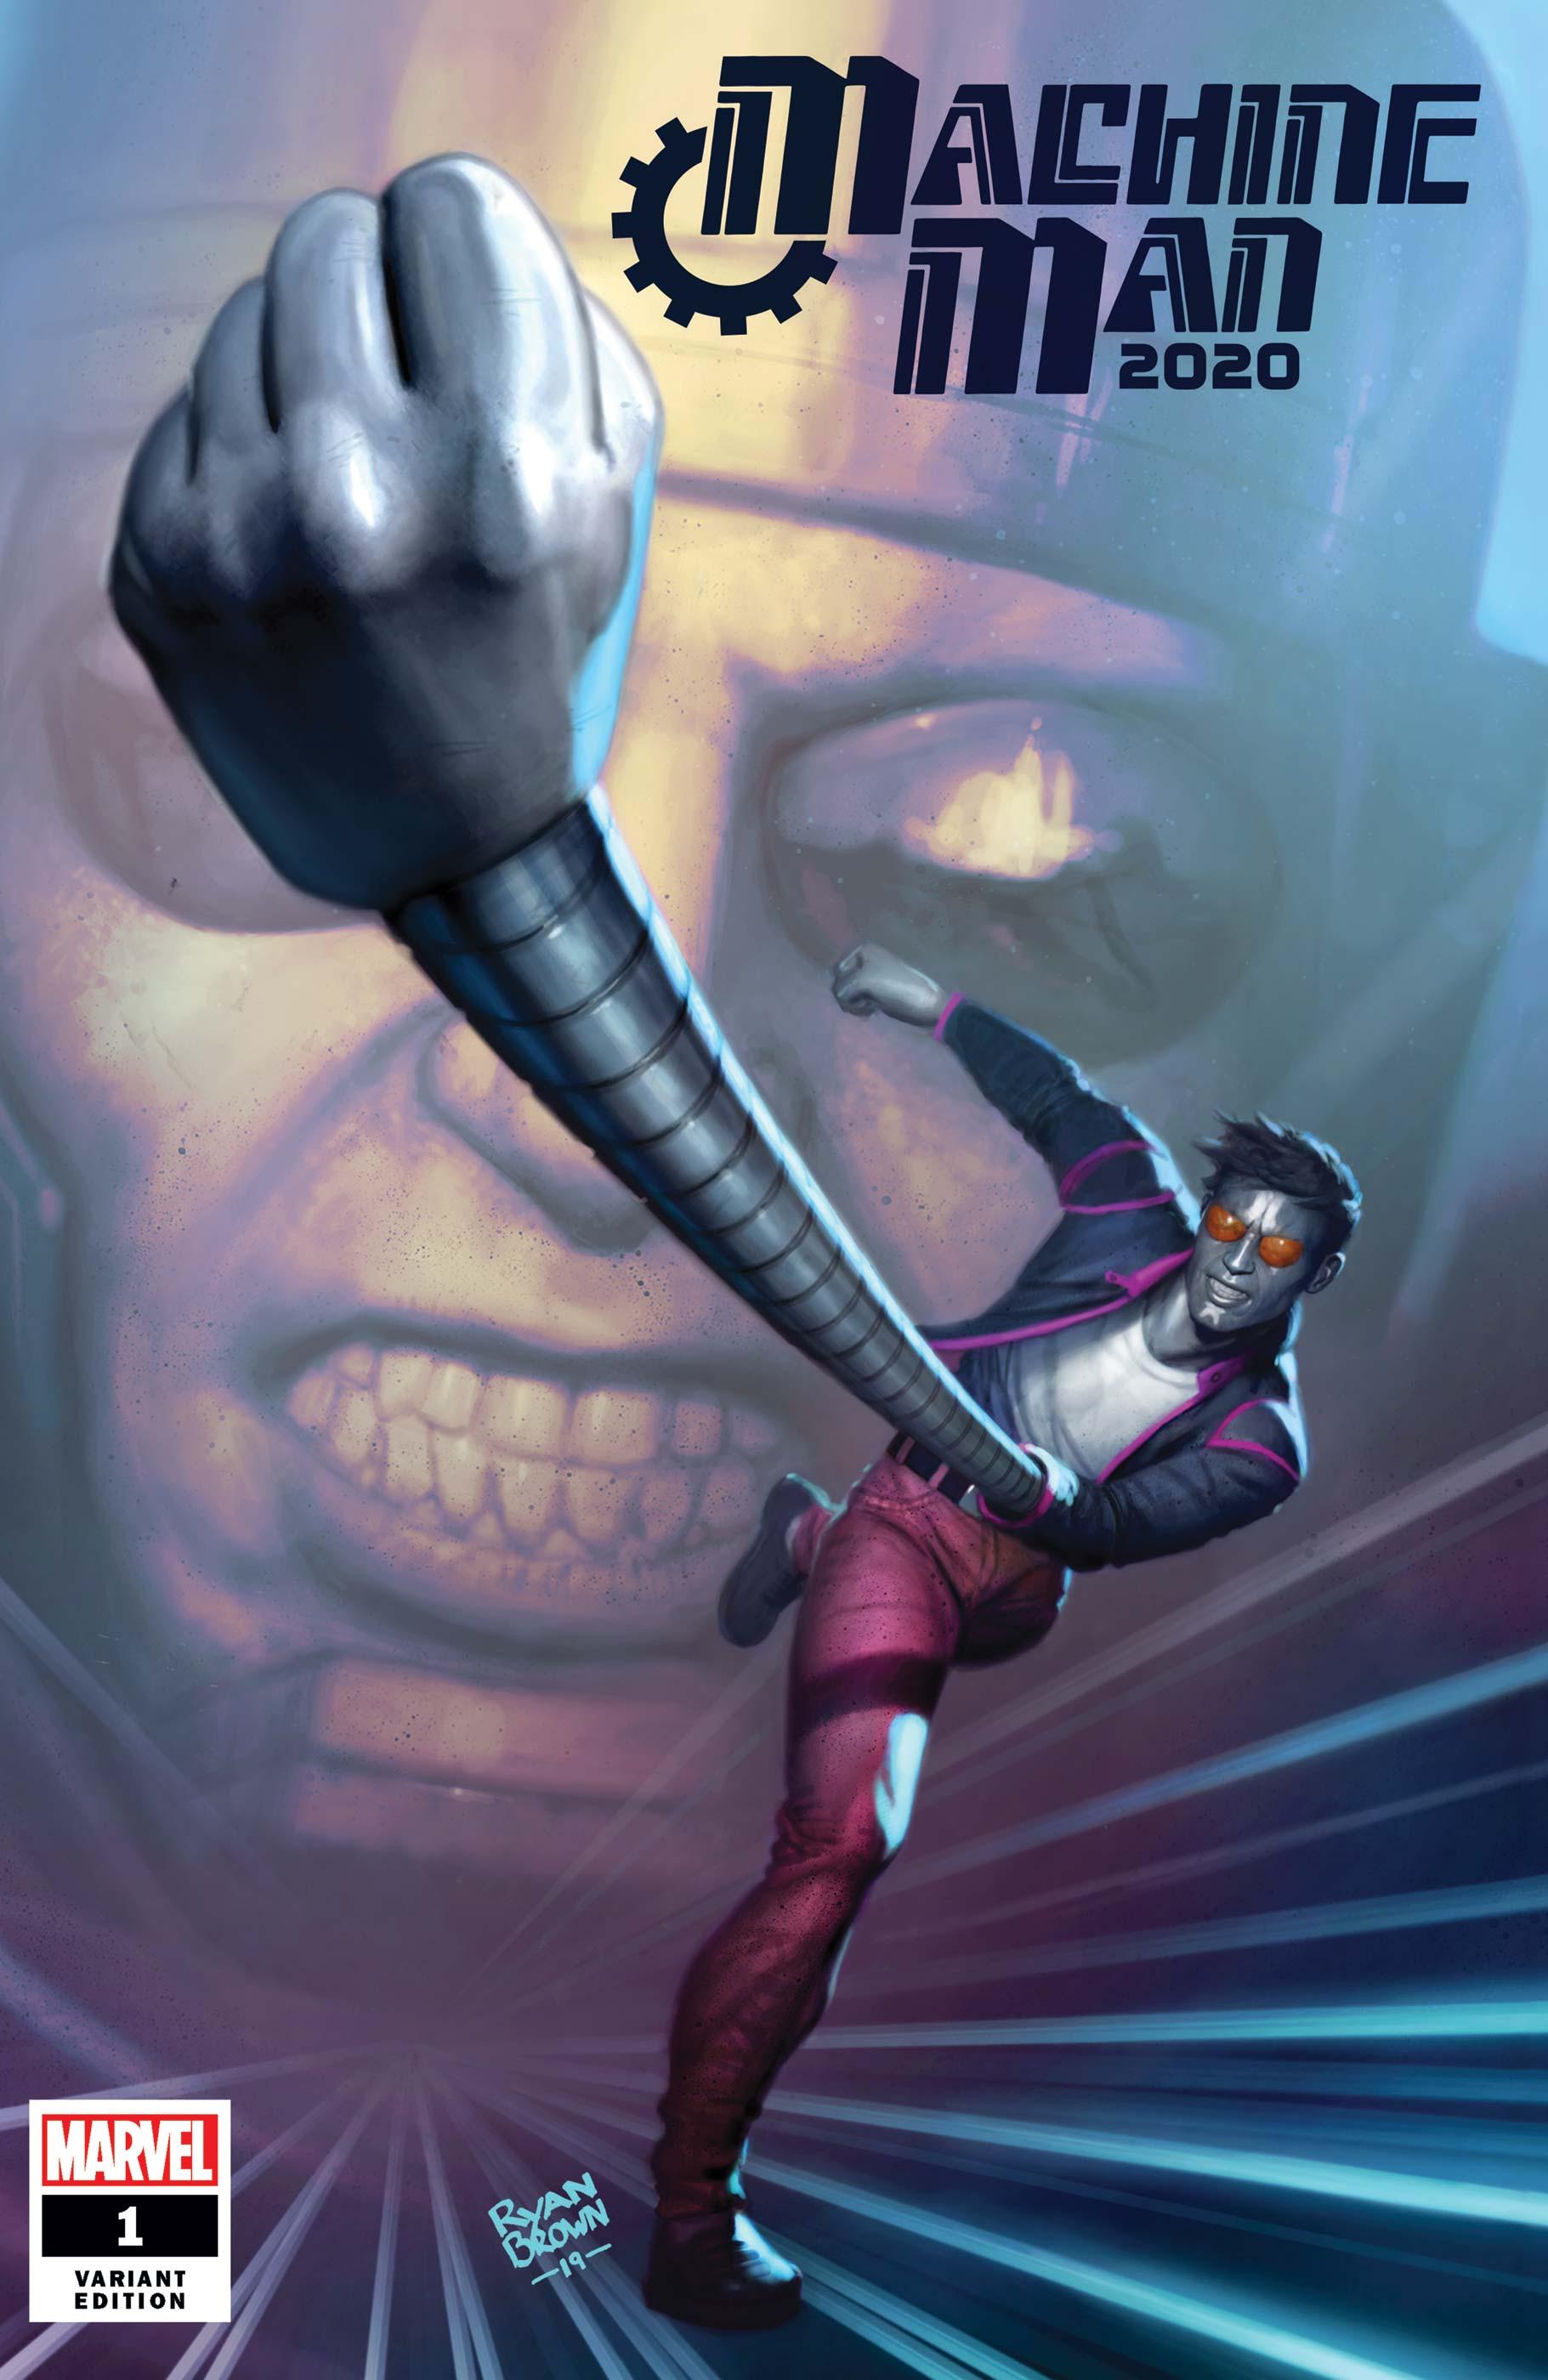 2020 Machine Man (2020) #1 (Variant)